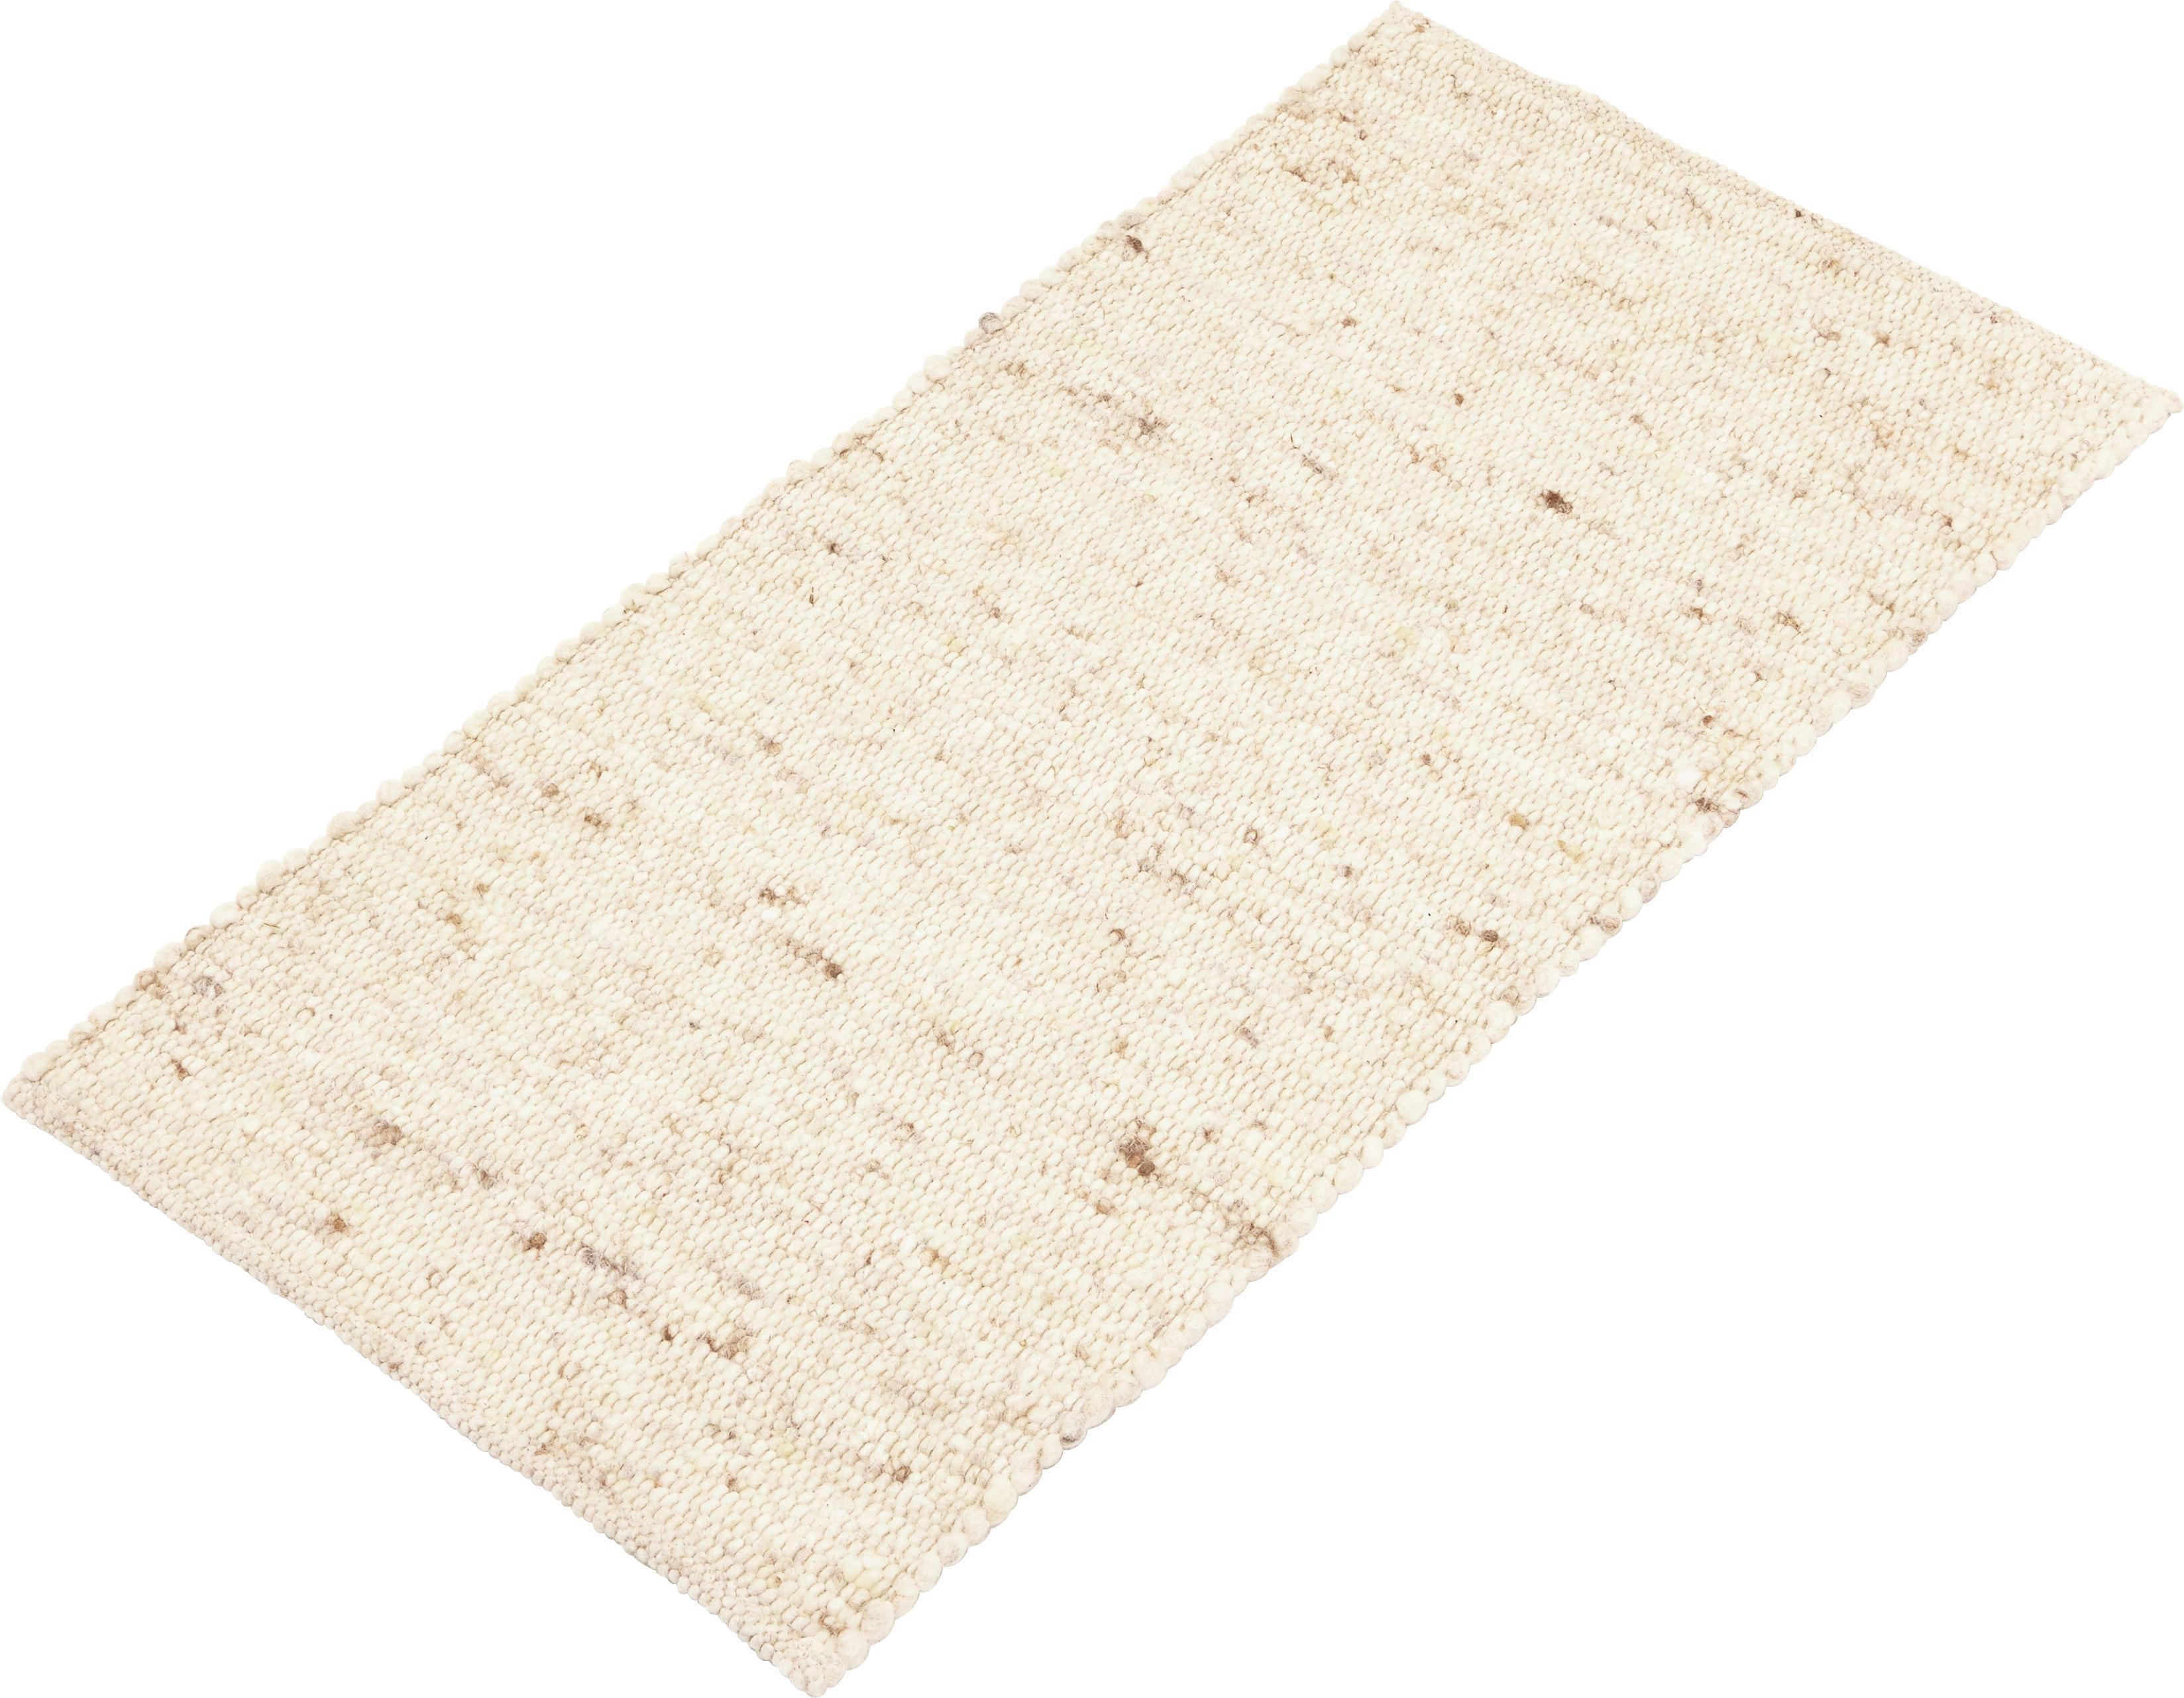 HANDWEBTEPPICH 200/290 cm - Creme, LIFESTYLE, Textil (200/290cm) - LINEA NATURA